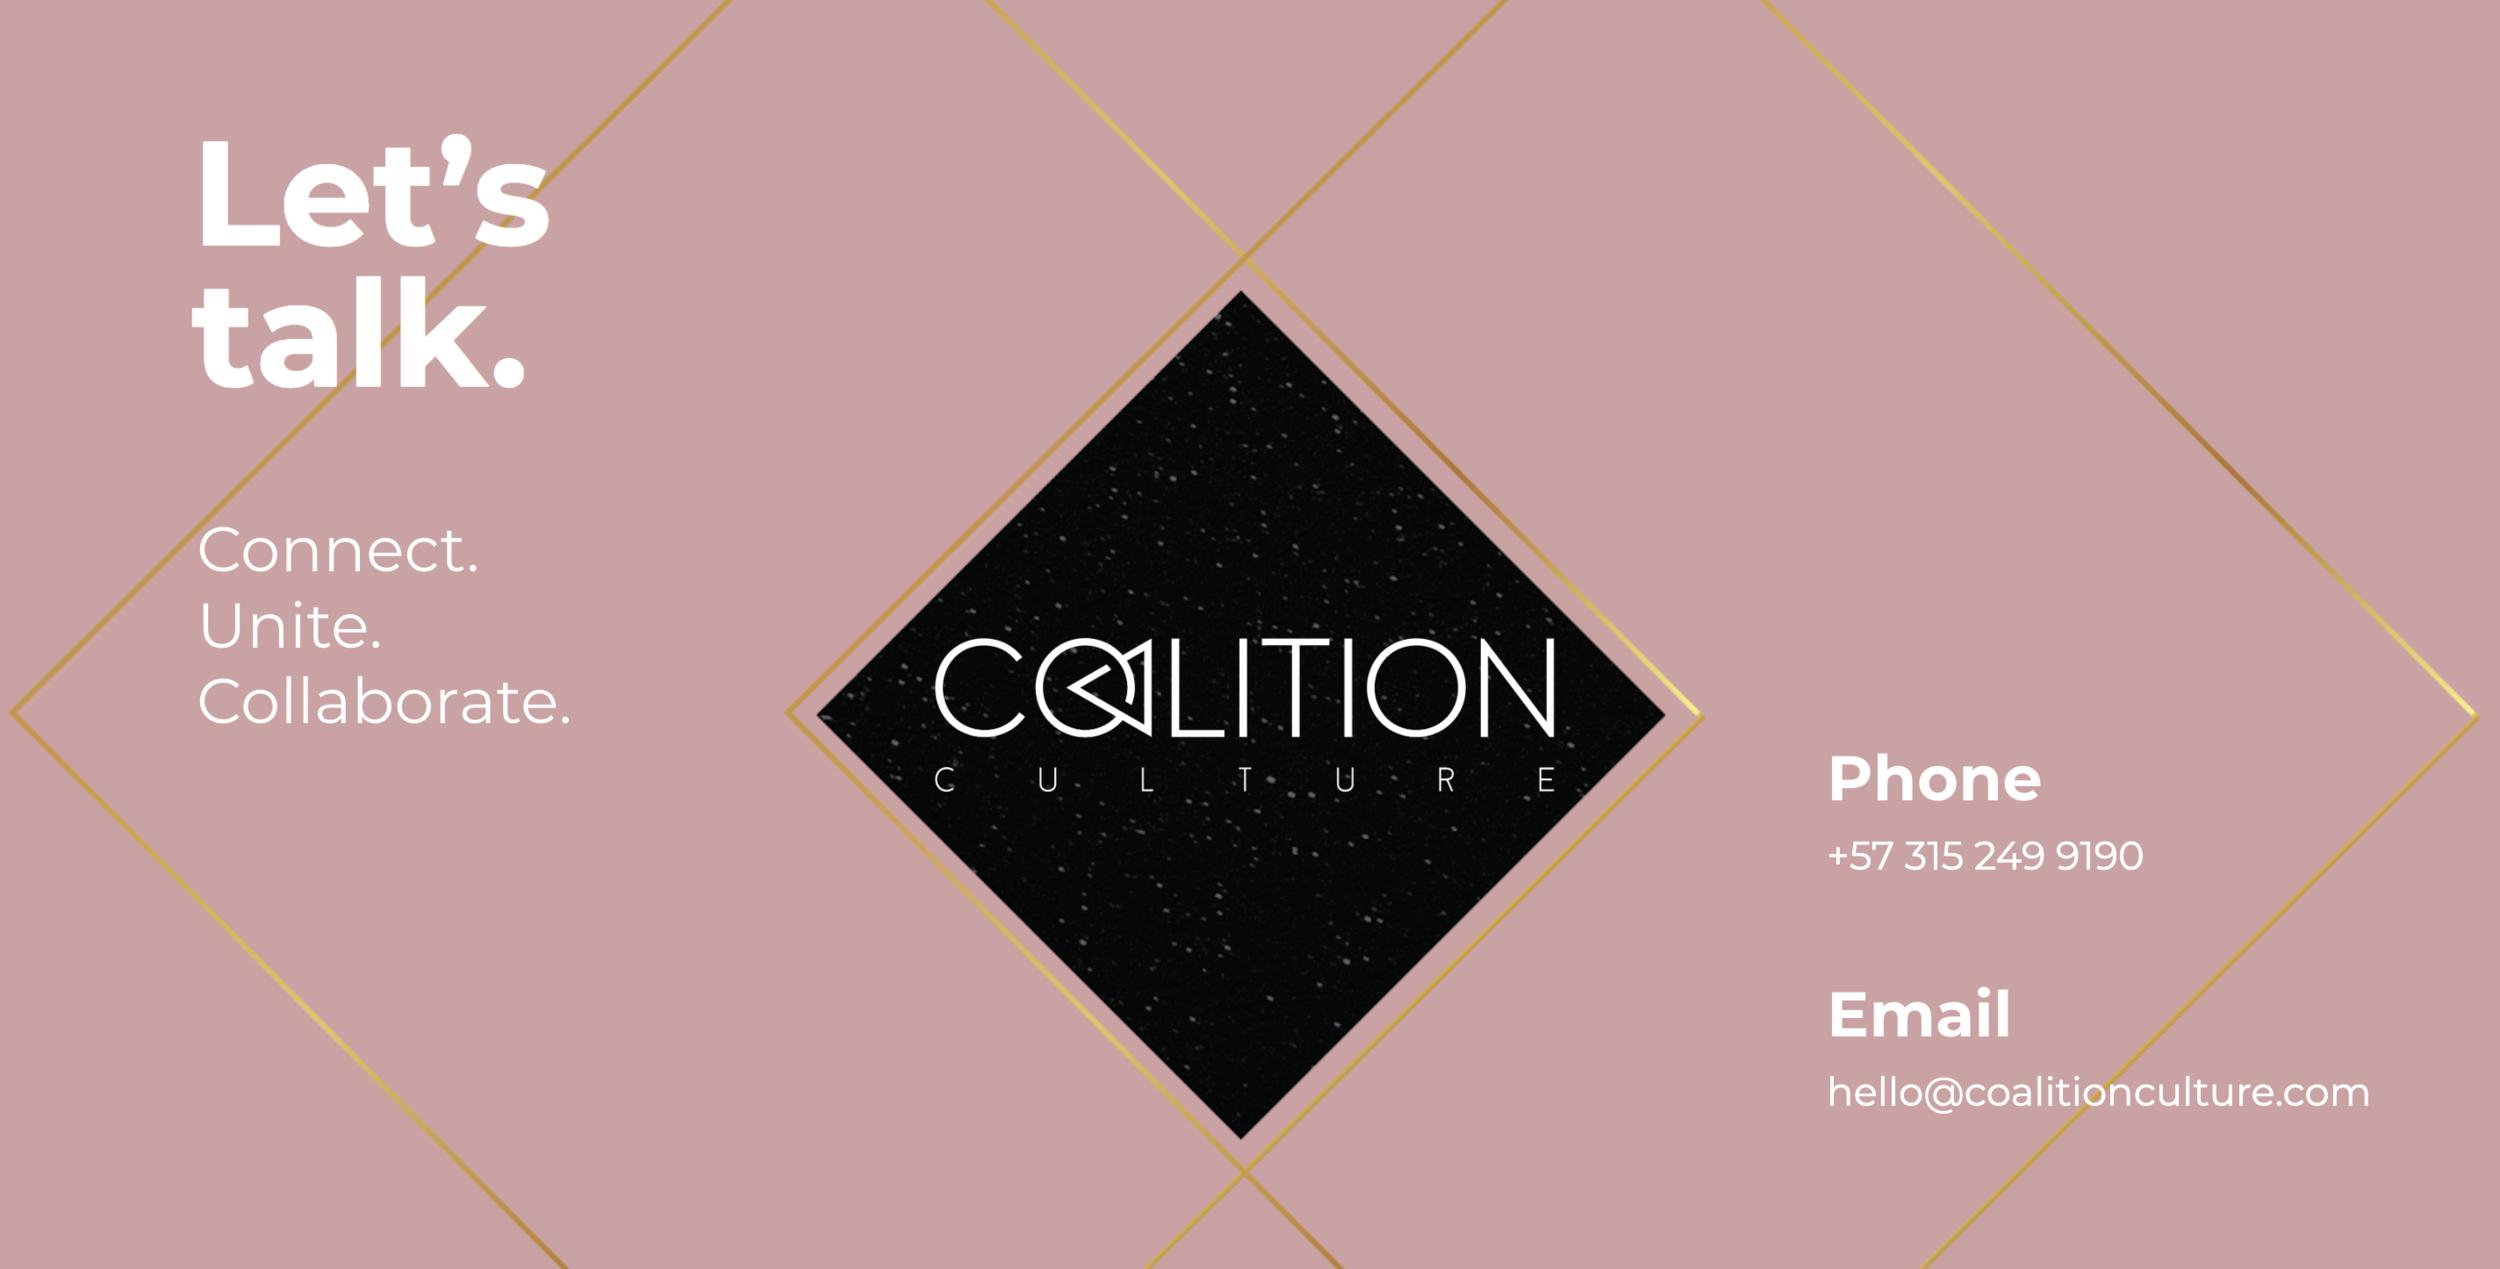 Contact Coalition Culture